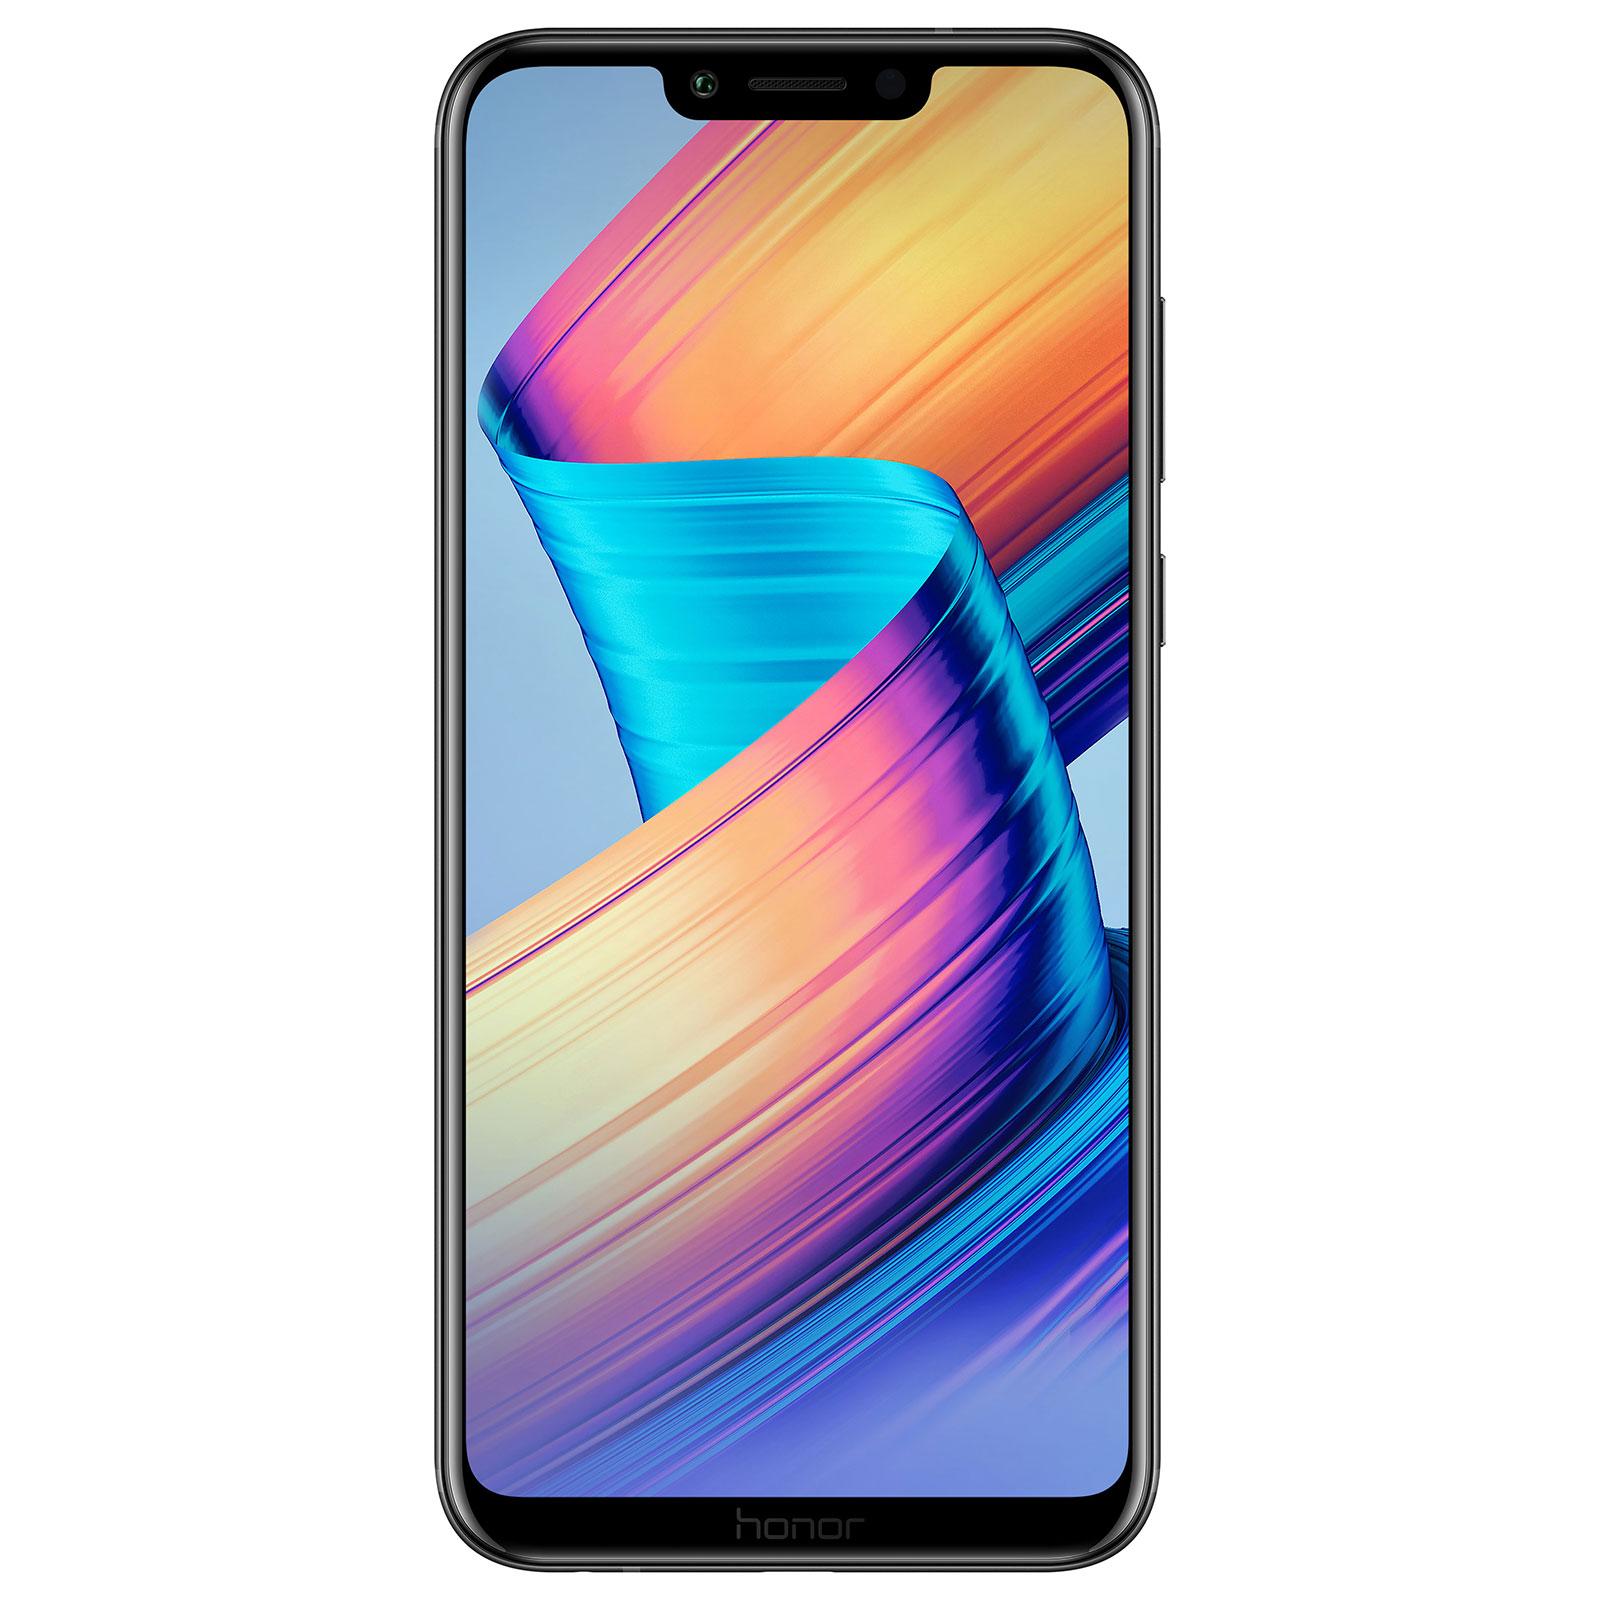 "Mobile & smartphone Honor Play Noir Smartphone 4G-LTE Advanced Dual SIM - Kirin 970 8-Core 2.4 GHz - RAM 4 Go - Ecran tactile 6.3"" 1080 x 2340 - 64 Go - Bluetooth 4.2 - 3750 mAh - Android 8.1"